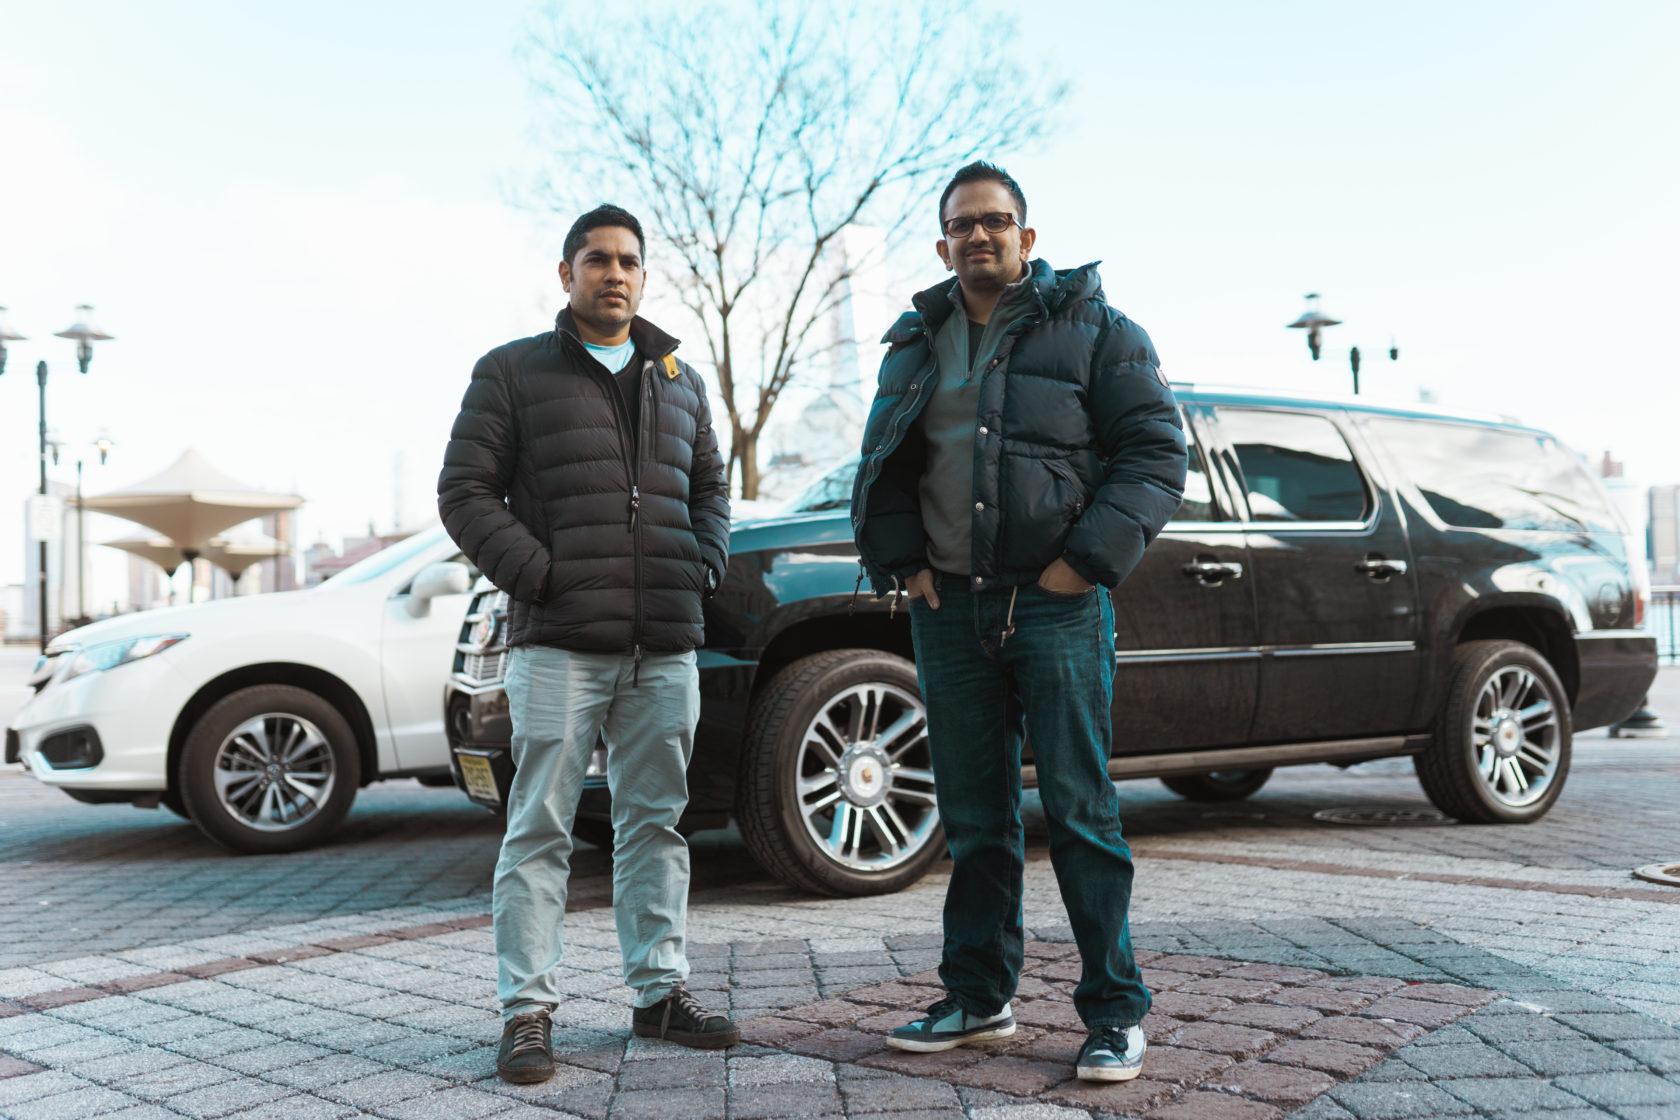 Wapanda Drivers: Jersey City's Newest C.E.O.'s - chicpeaJC